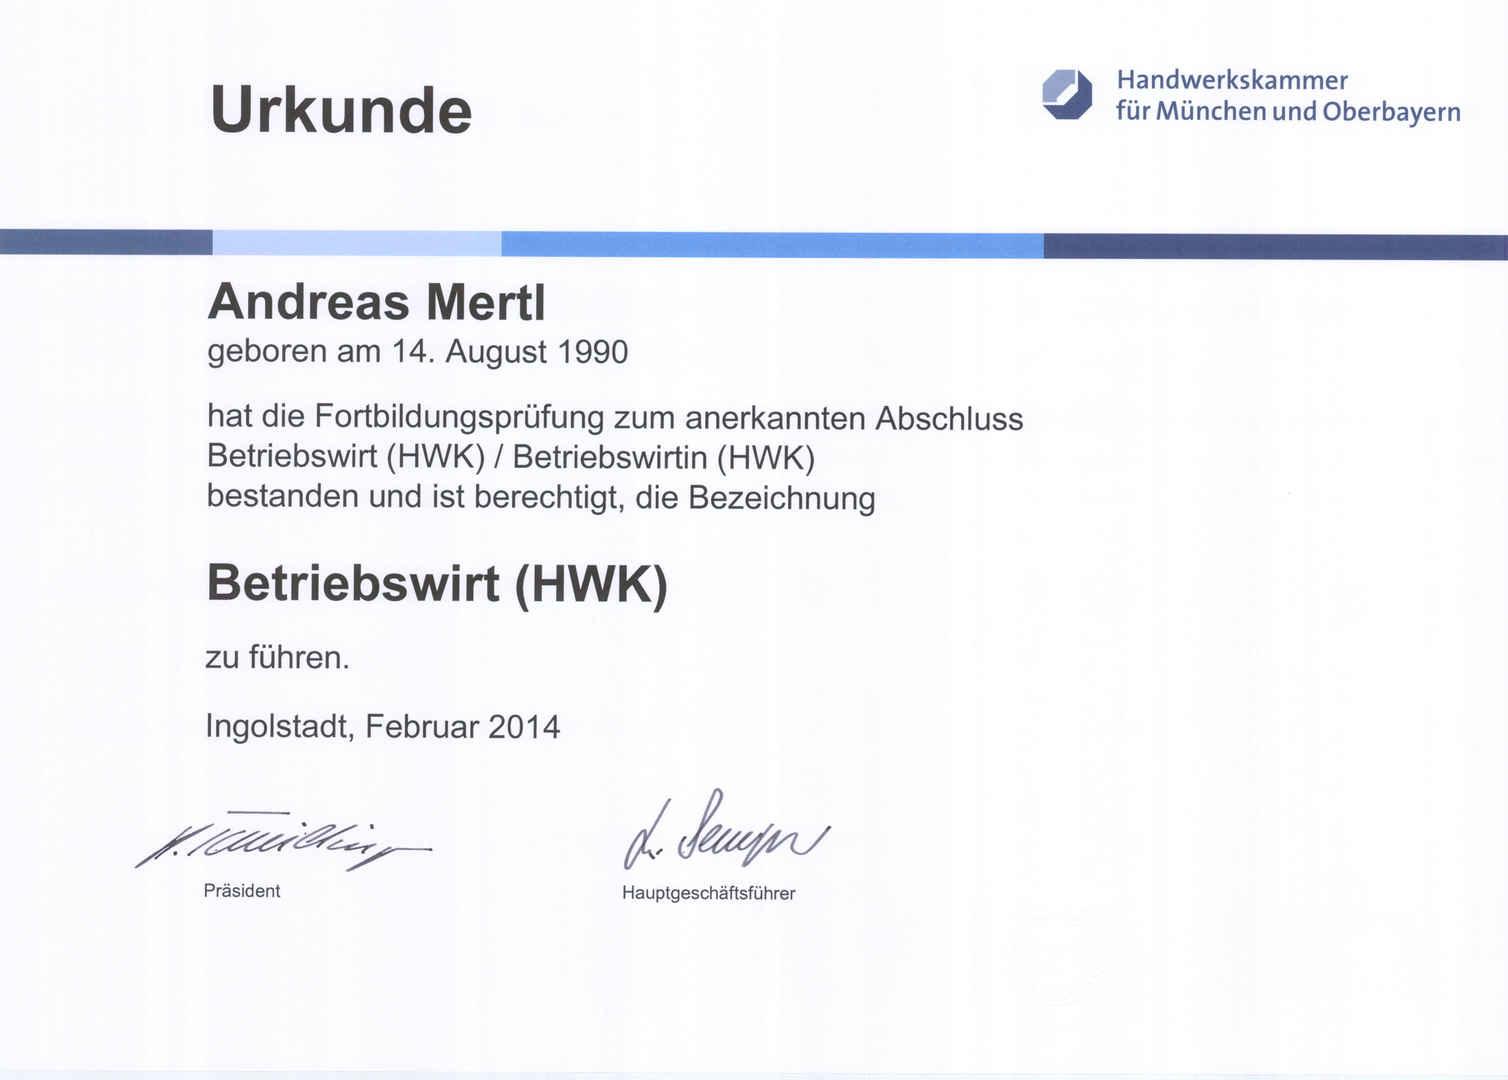 Betriebswirt HWK Urkunde.jpg